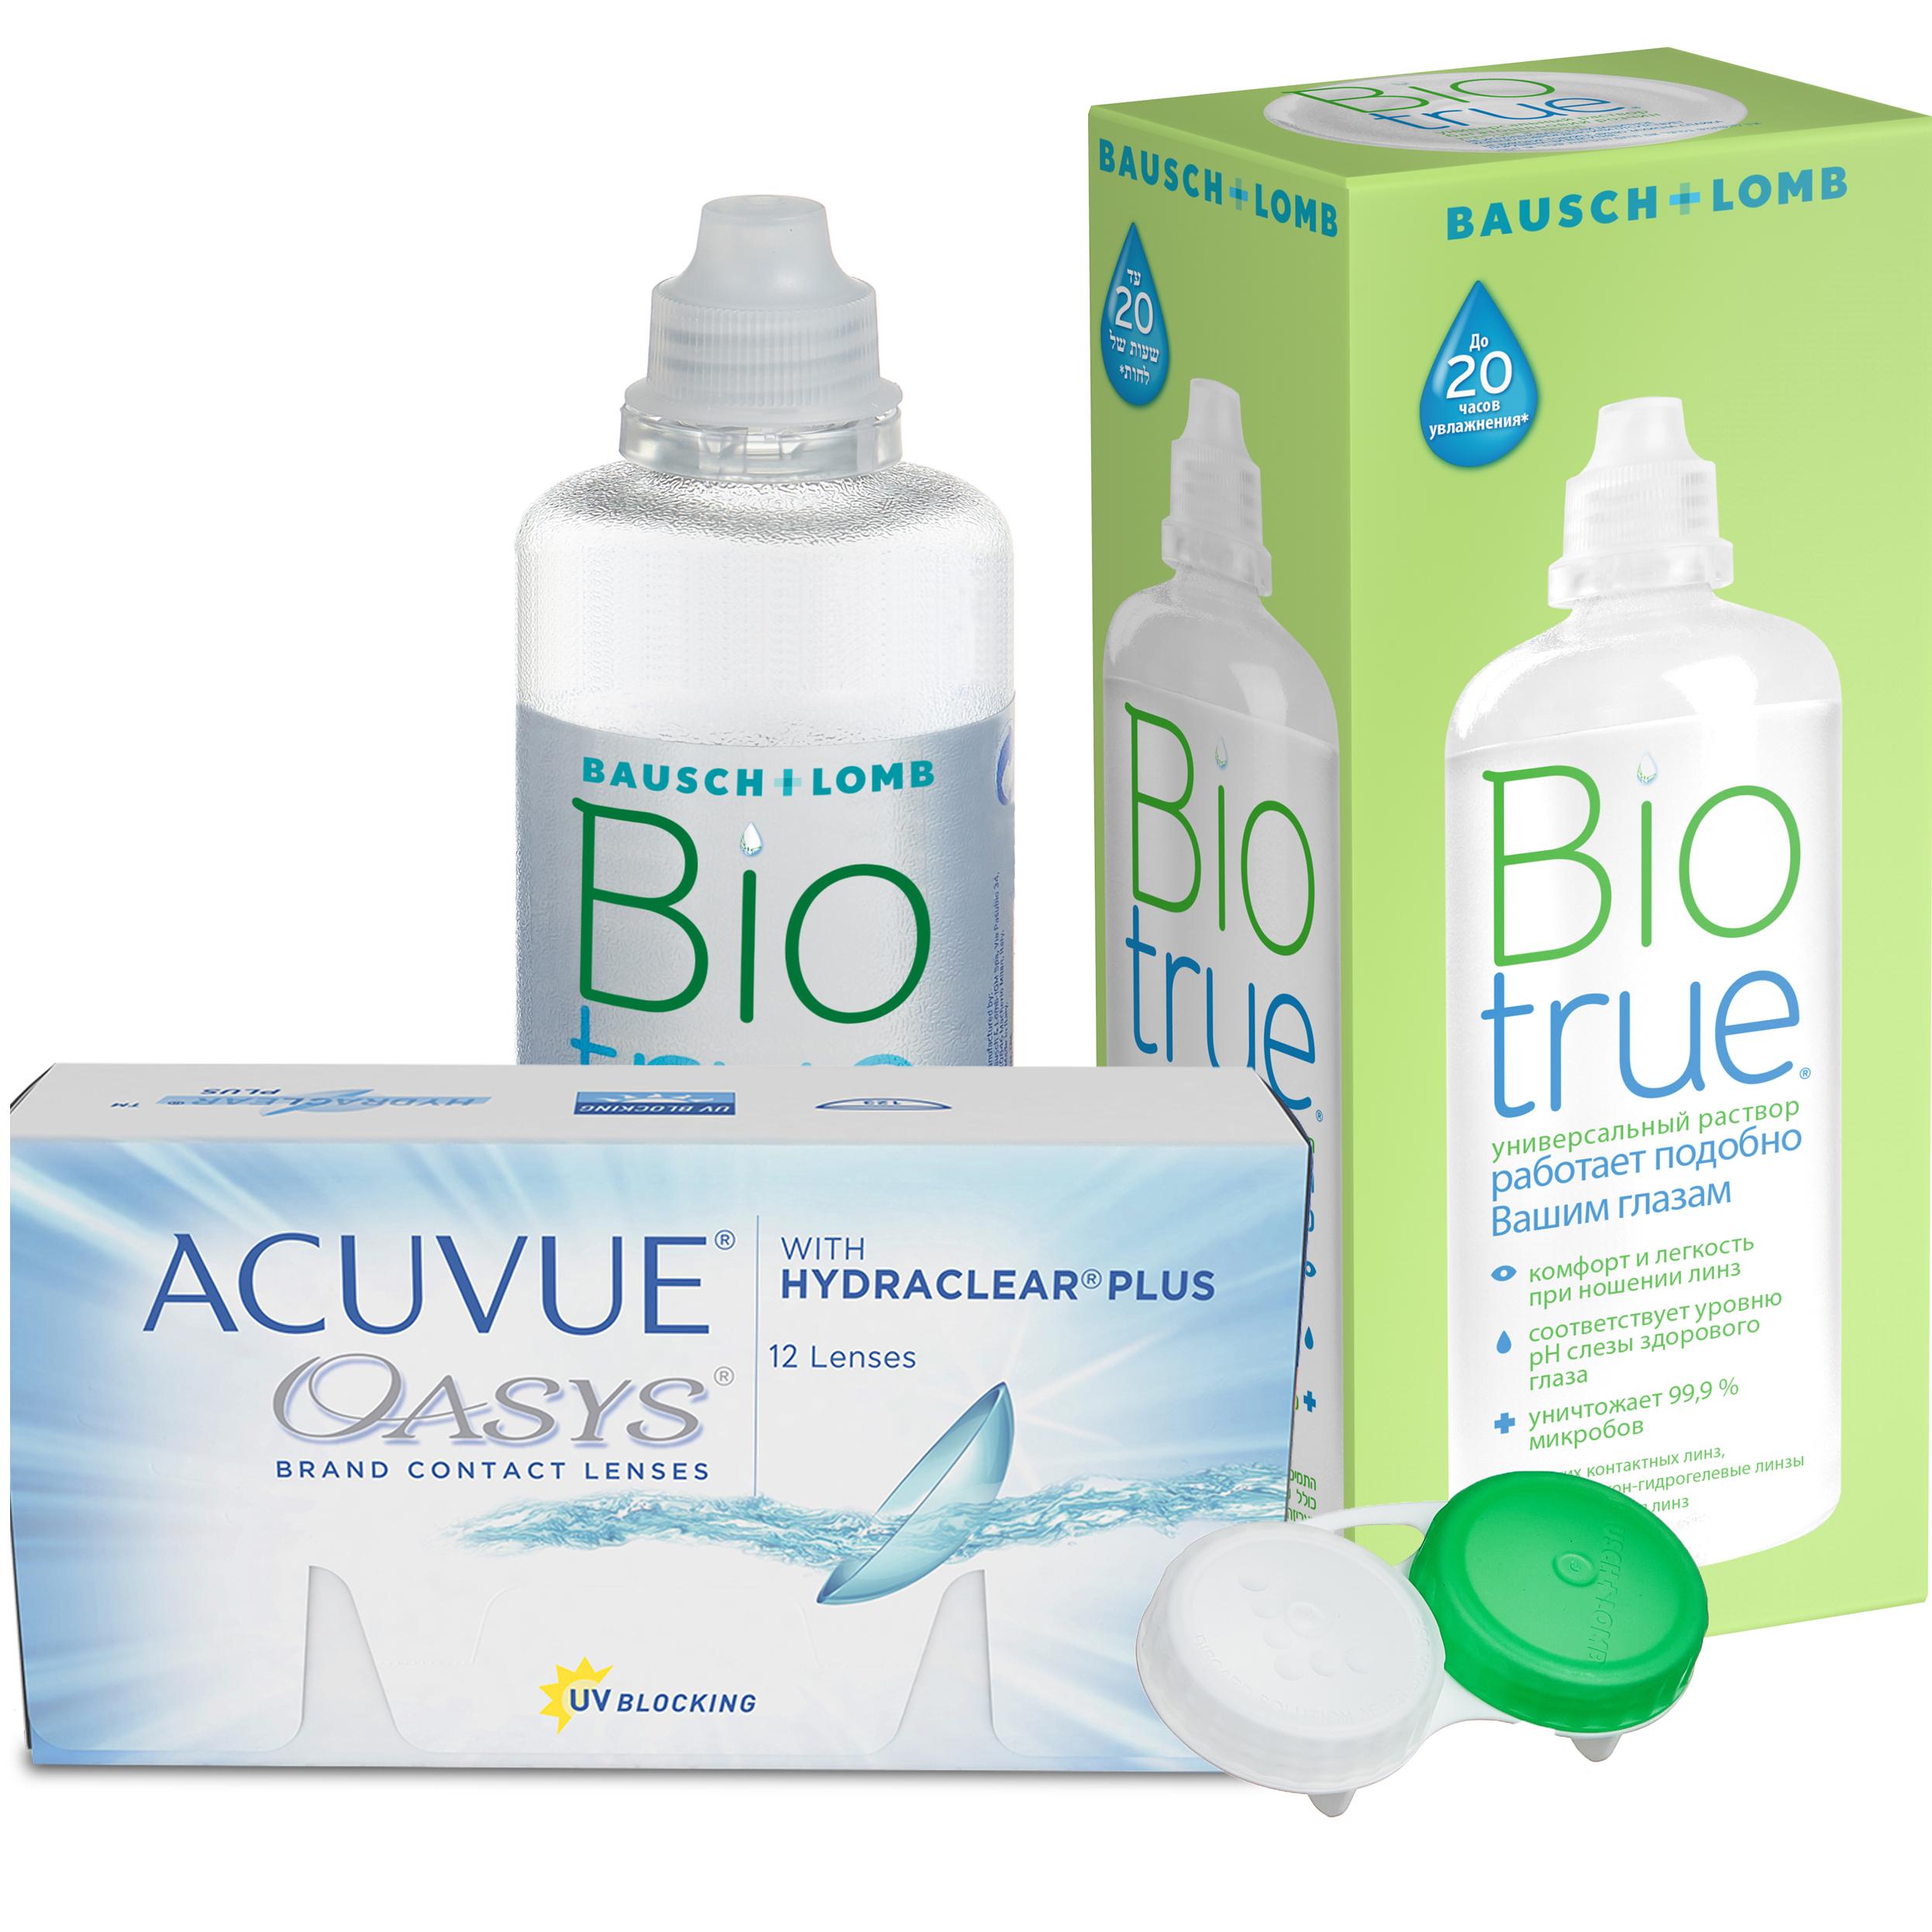 Купить Oasys with Hydraclear Plus 12 линз + Biotrue, Контактные линзы Acuvue Oasys with Hydraclear Plus 12 линз R 8.4 -2, 00 + Biotrue 300 мл